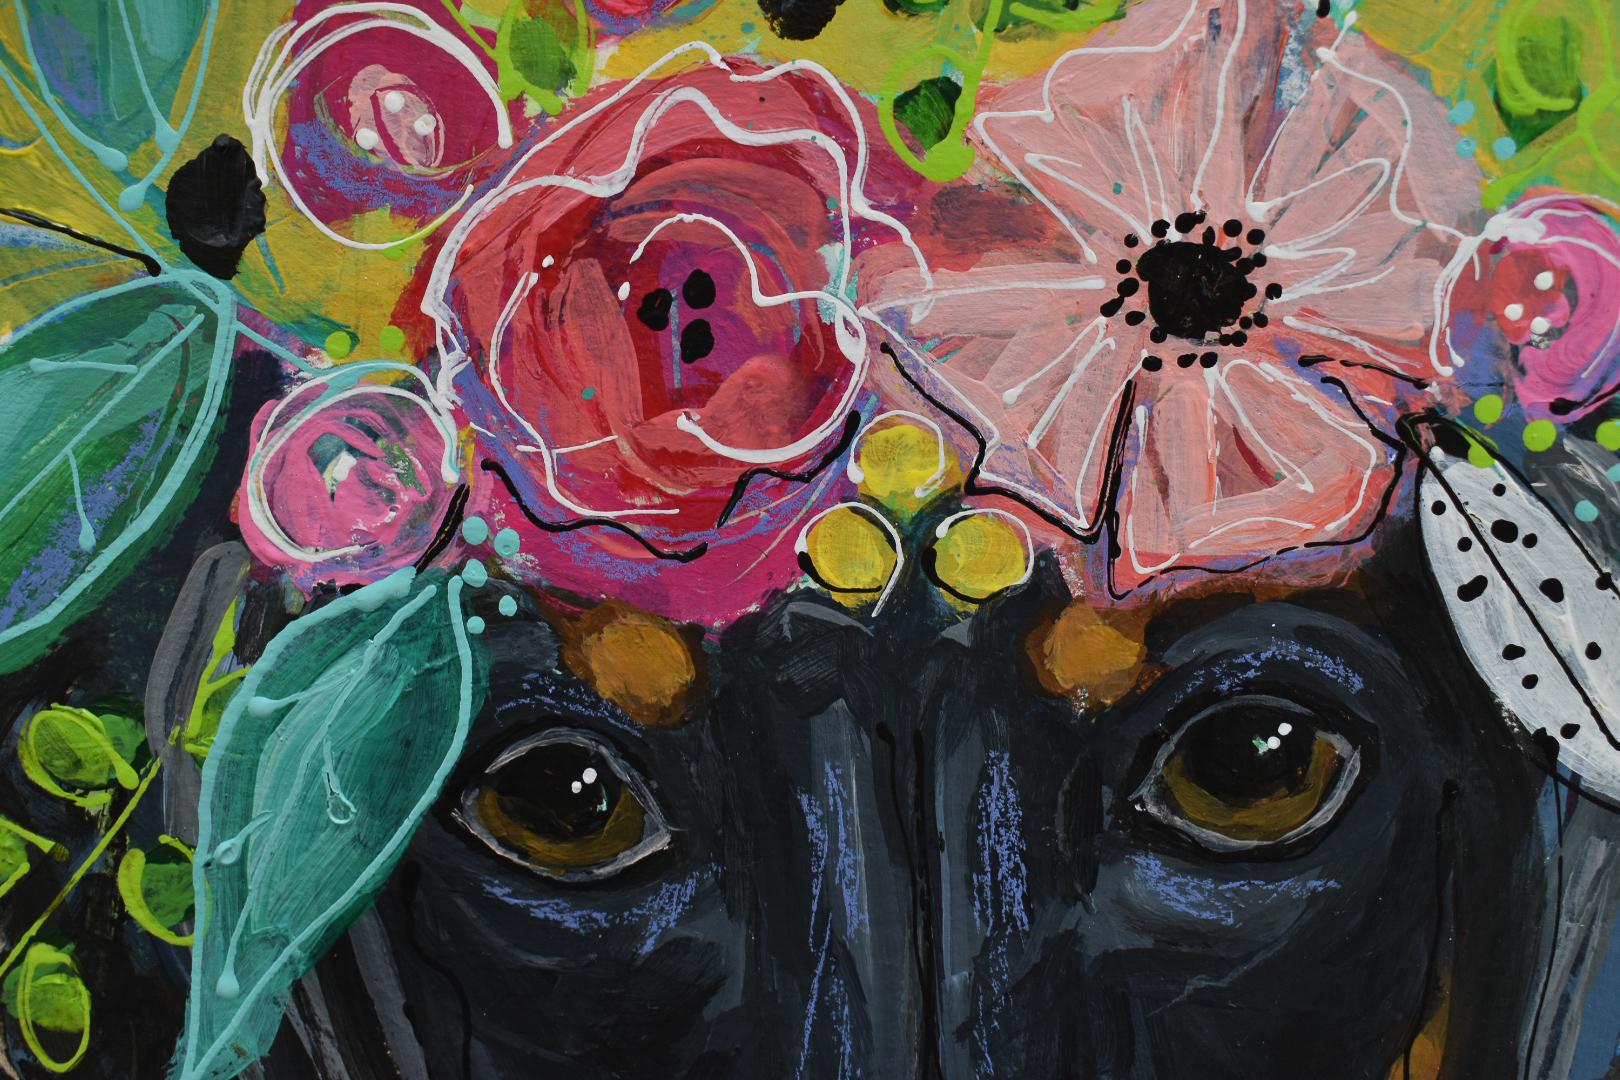 bohopainting_dachshund_petportrait_flowercrown_daisyfaithart6.jpg